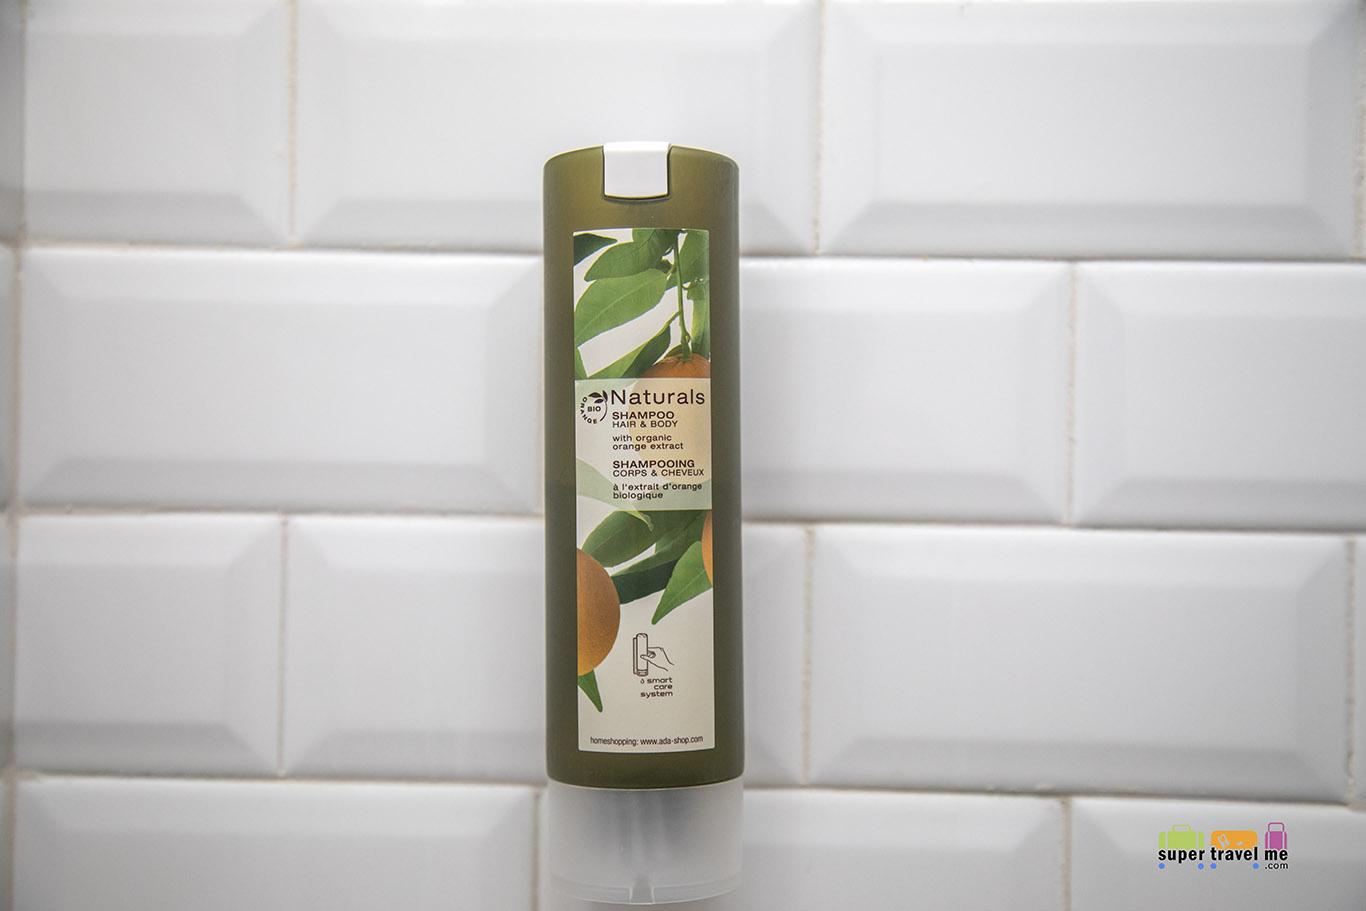 Aerotel Kuala Lumpur Naturals Hair & Body Shampoo - Smart Care 300ml